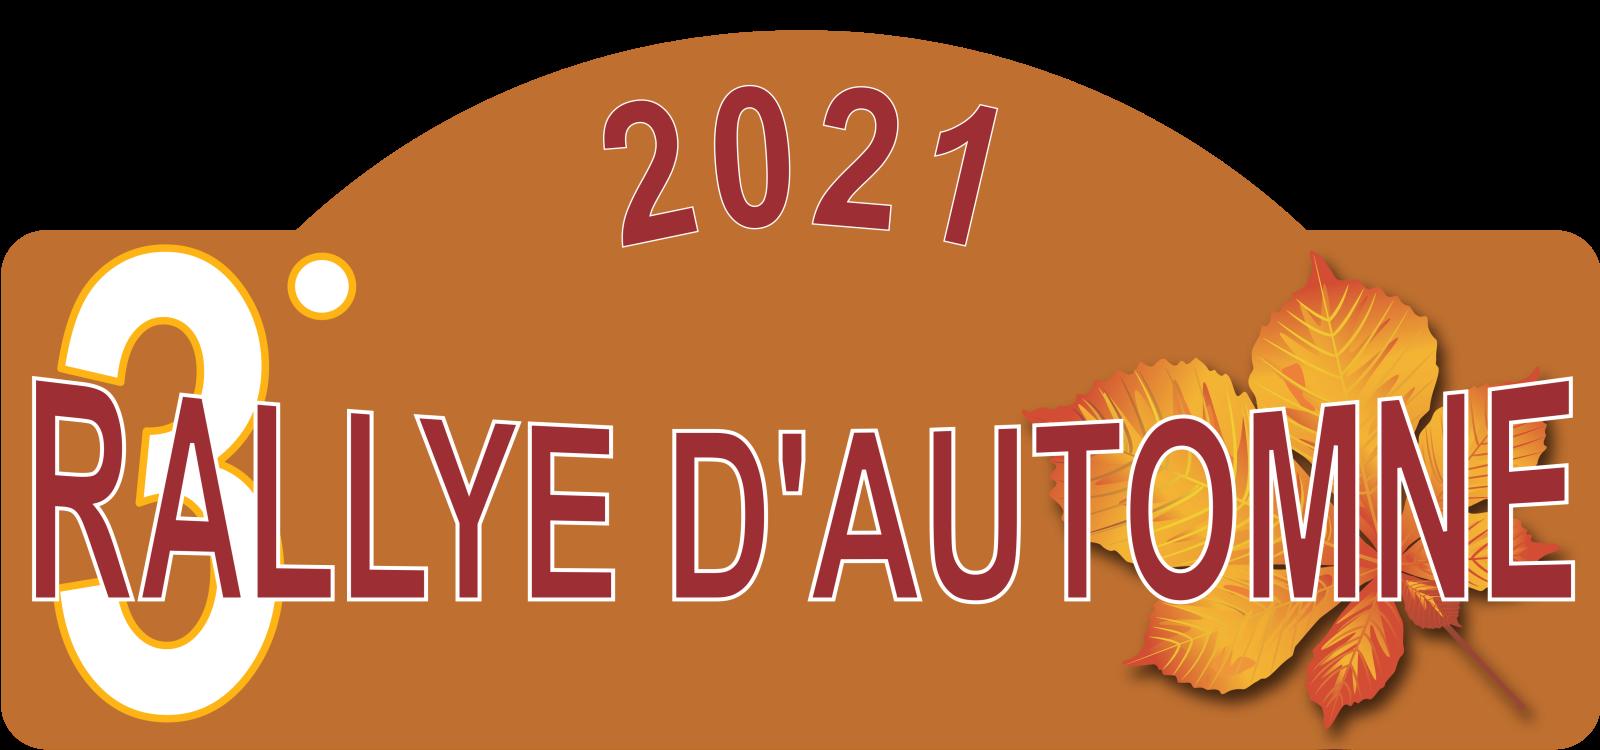 Rallye d'automne_ 23 octobre 2021 Logo